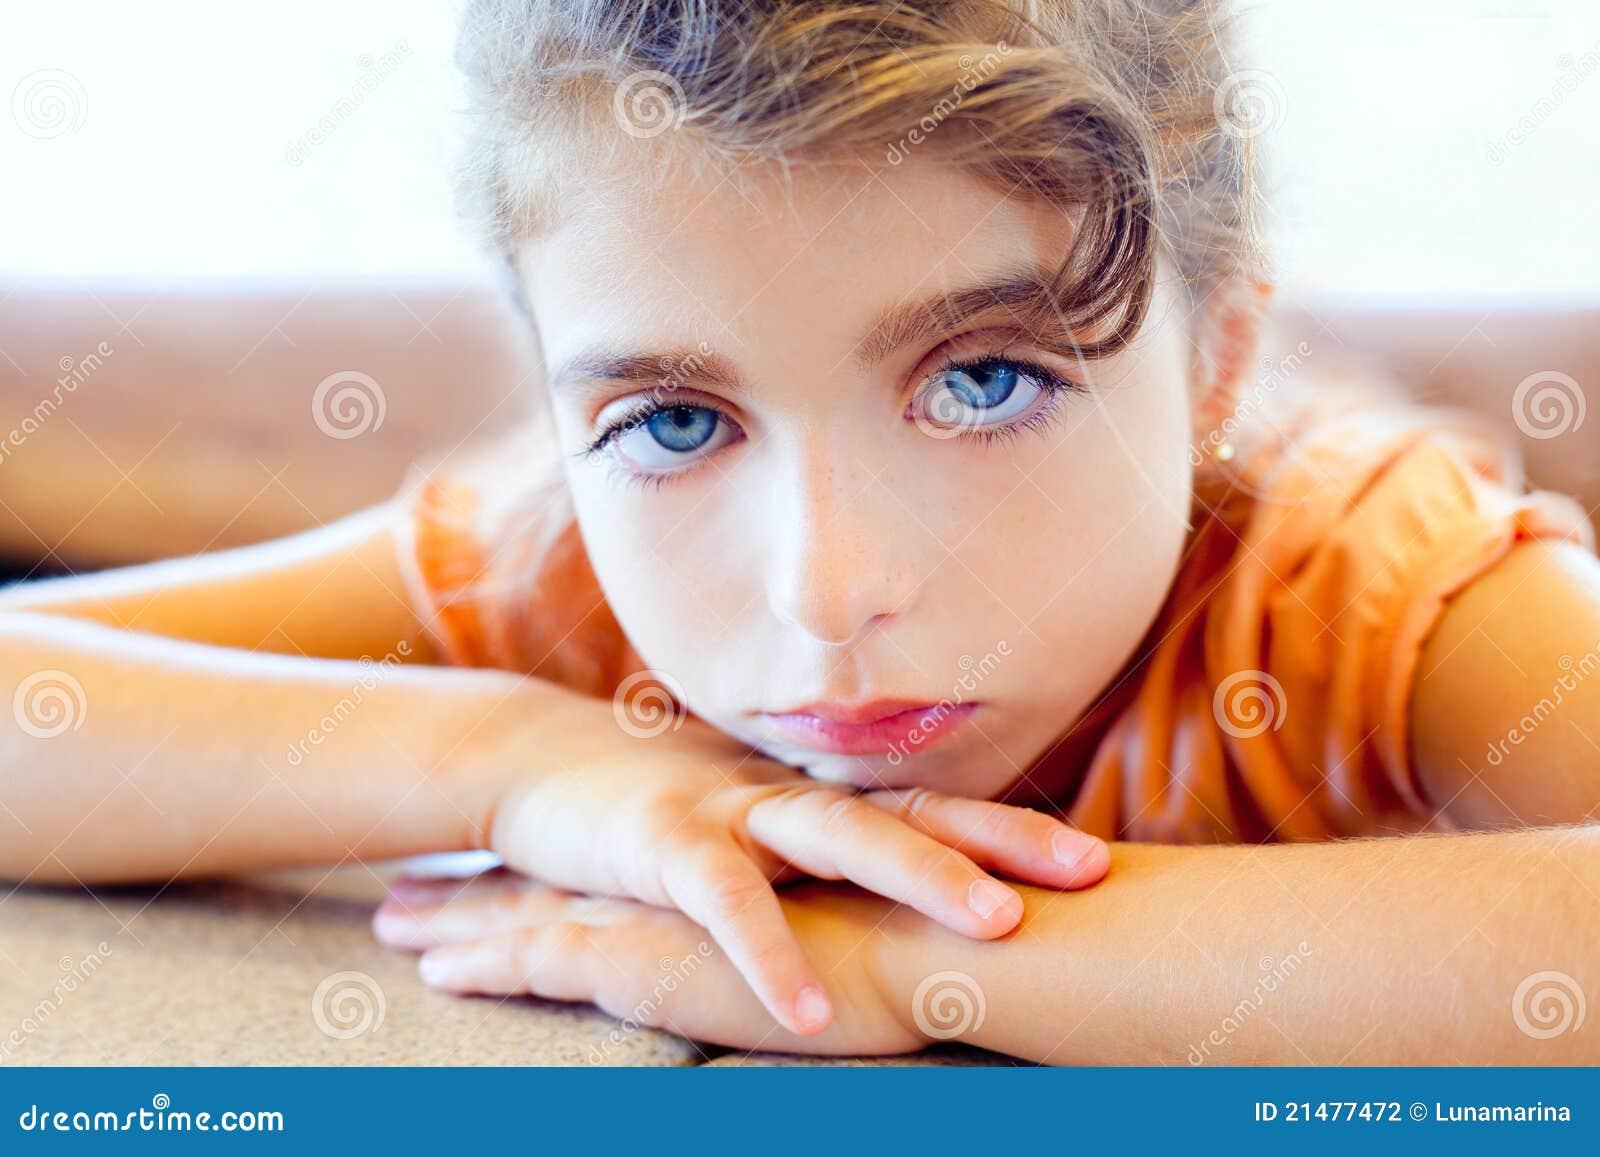 Blue Eyes Sad Children Girl Crossed Arms Stock Photo